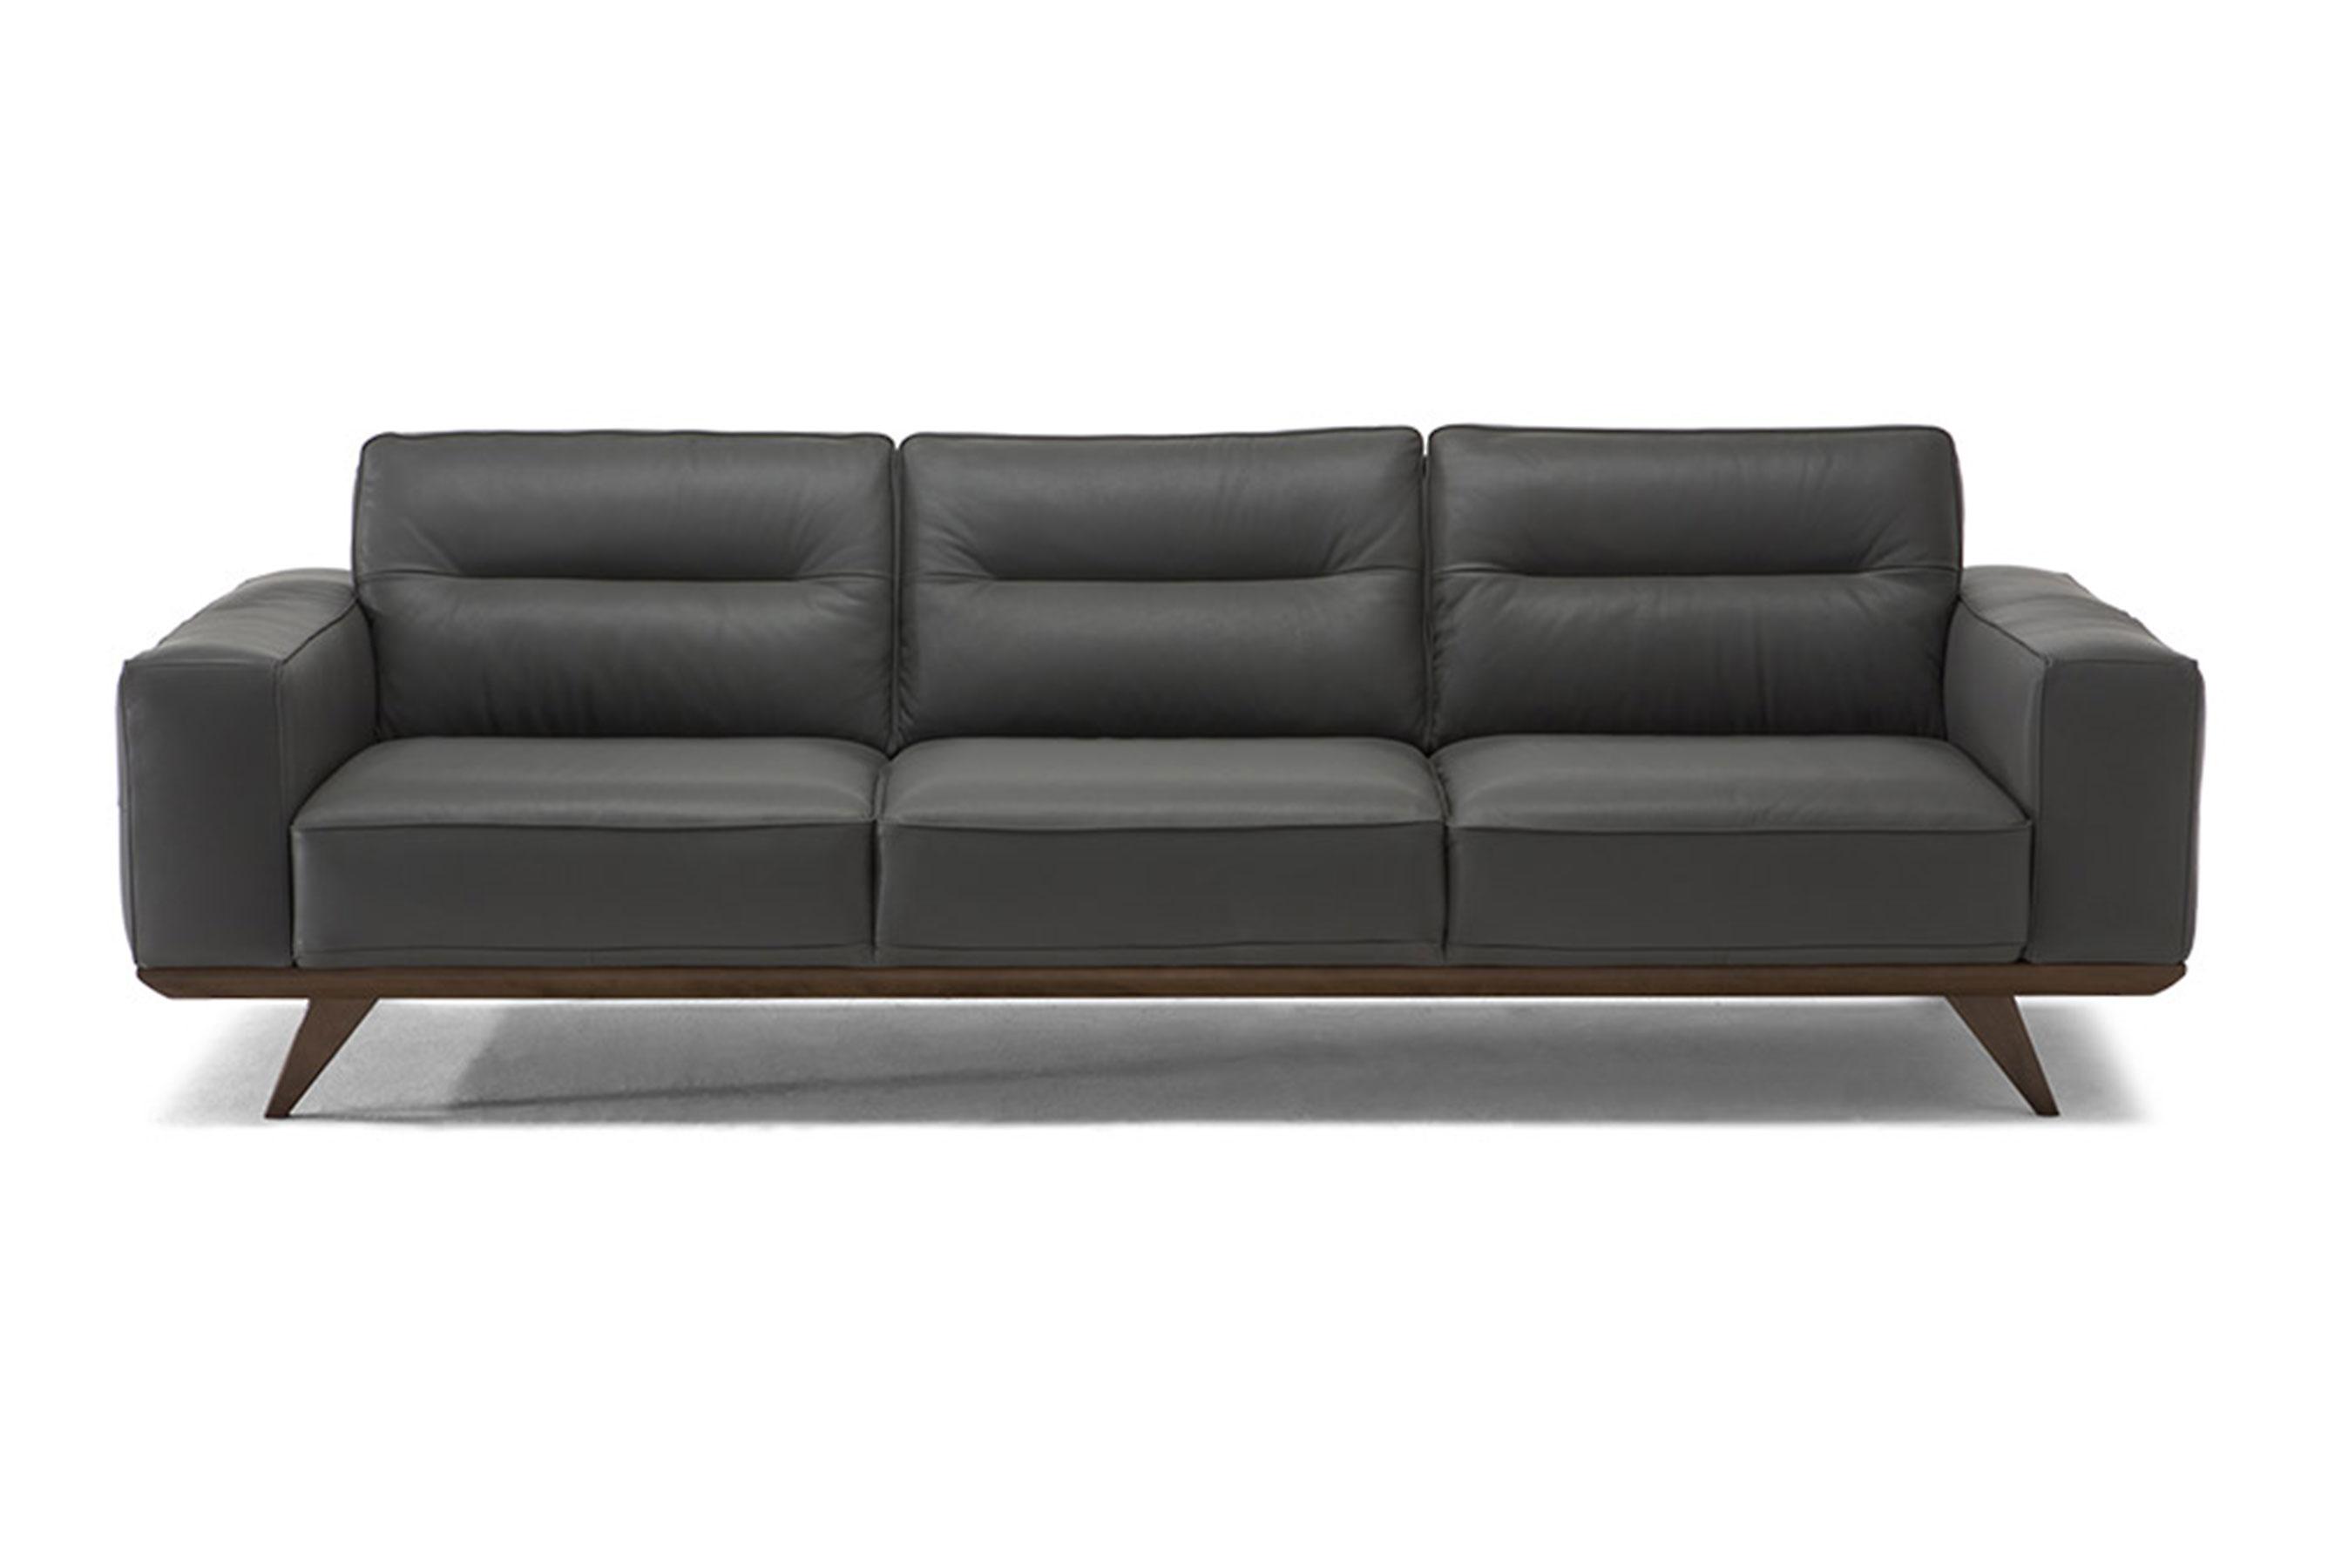 furniture s discount and sofas loveseats cheap sofa watch youtube melanie bob loveseat